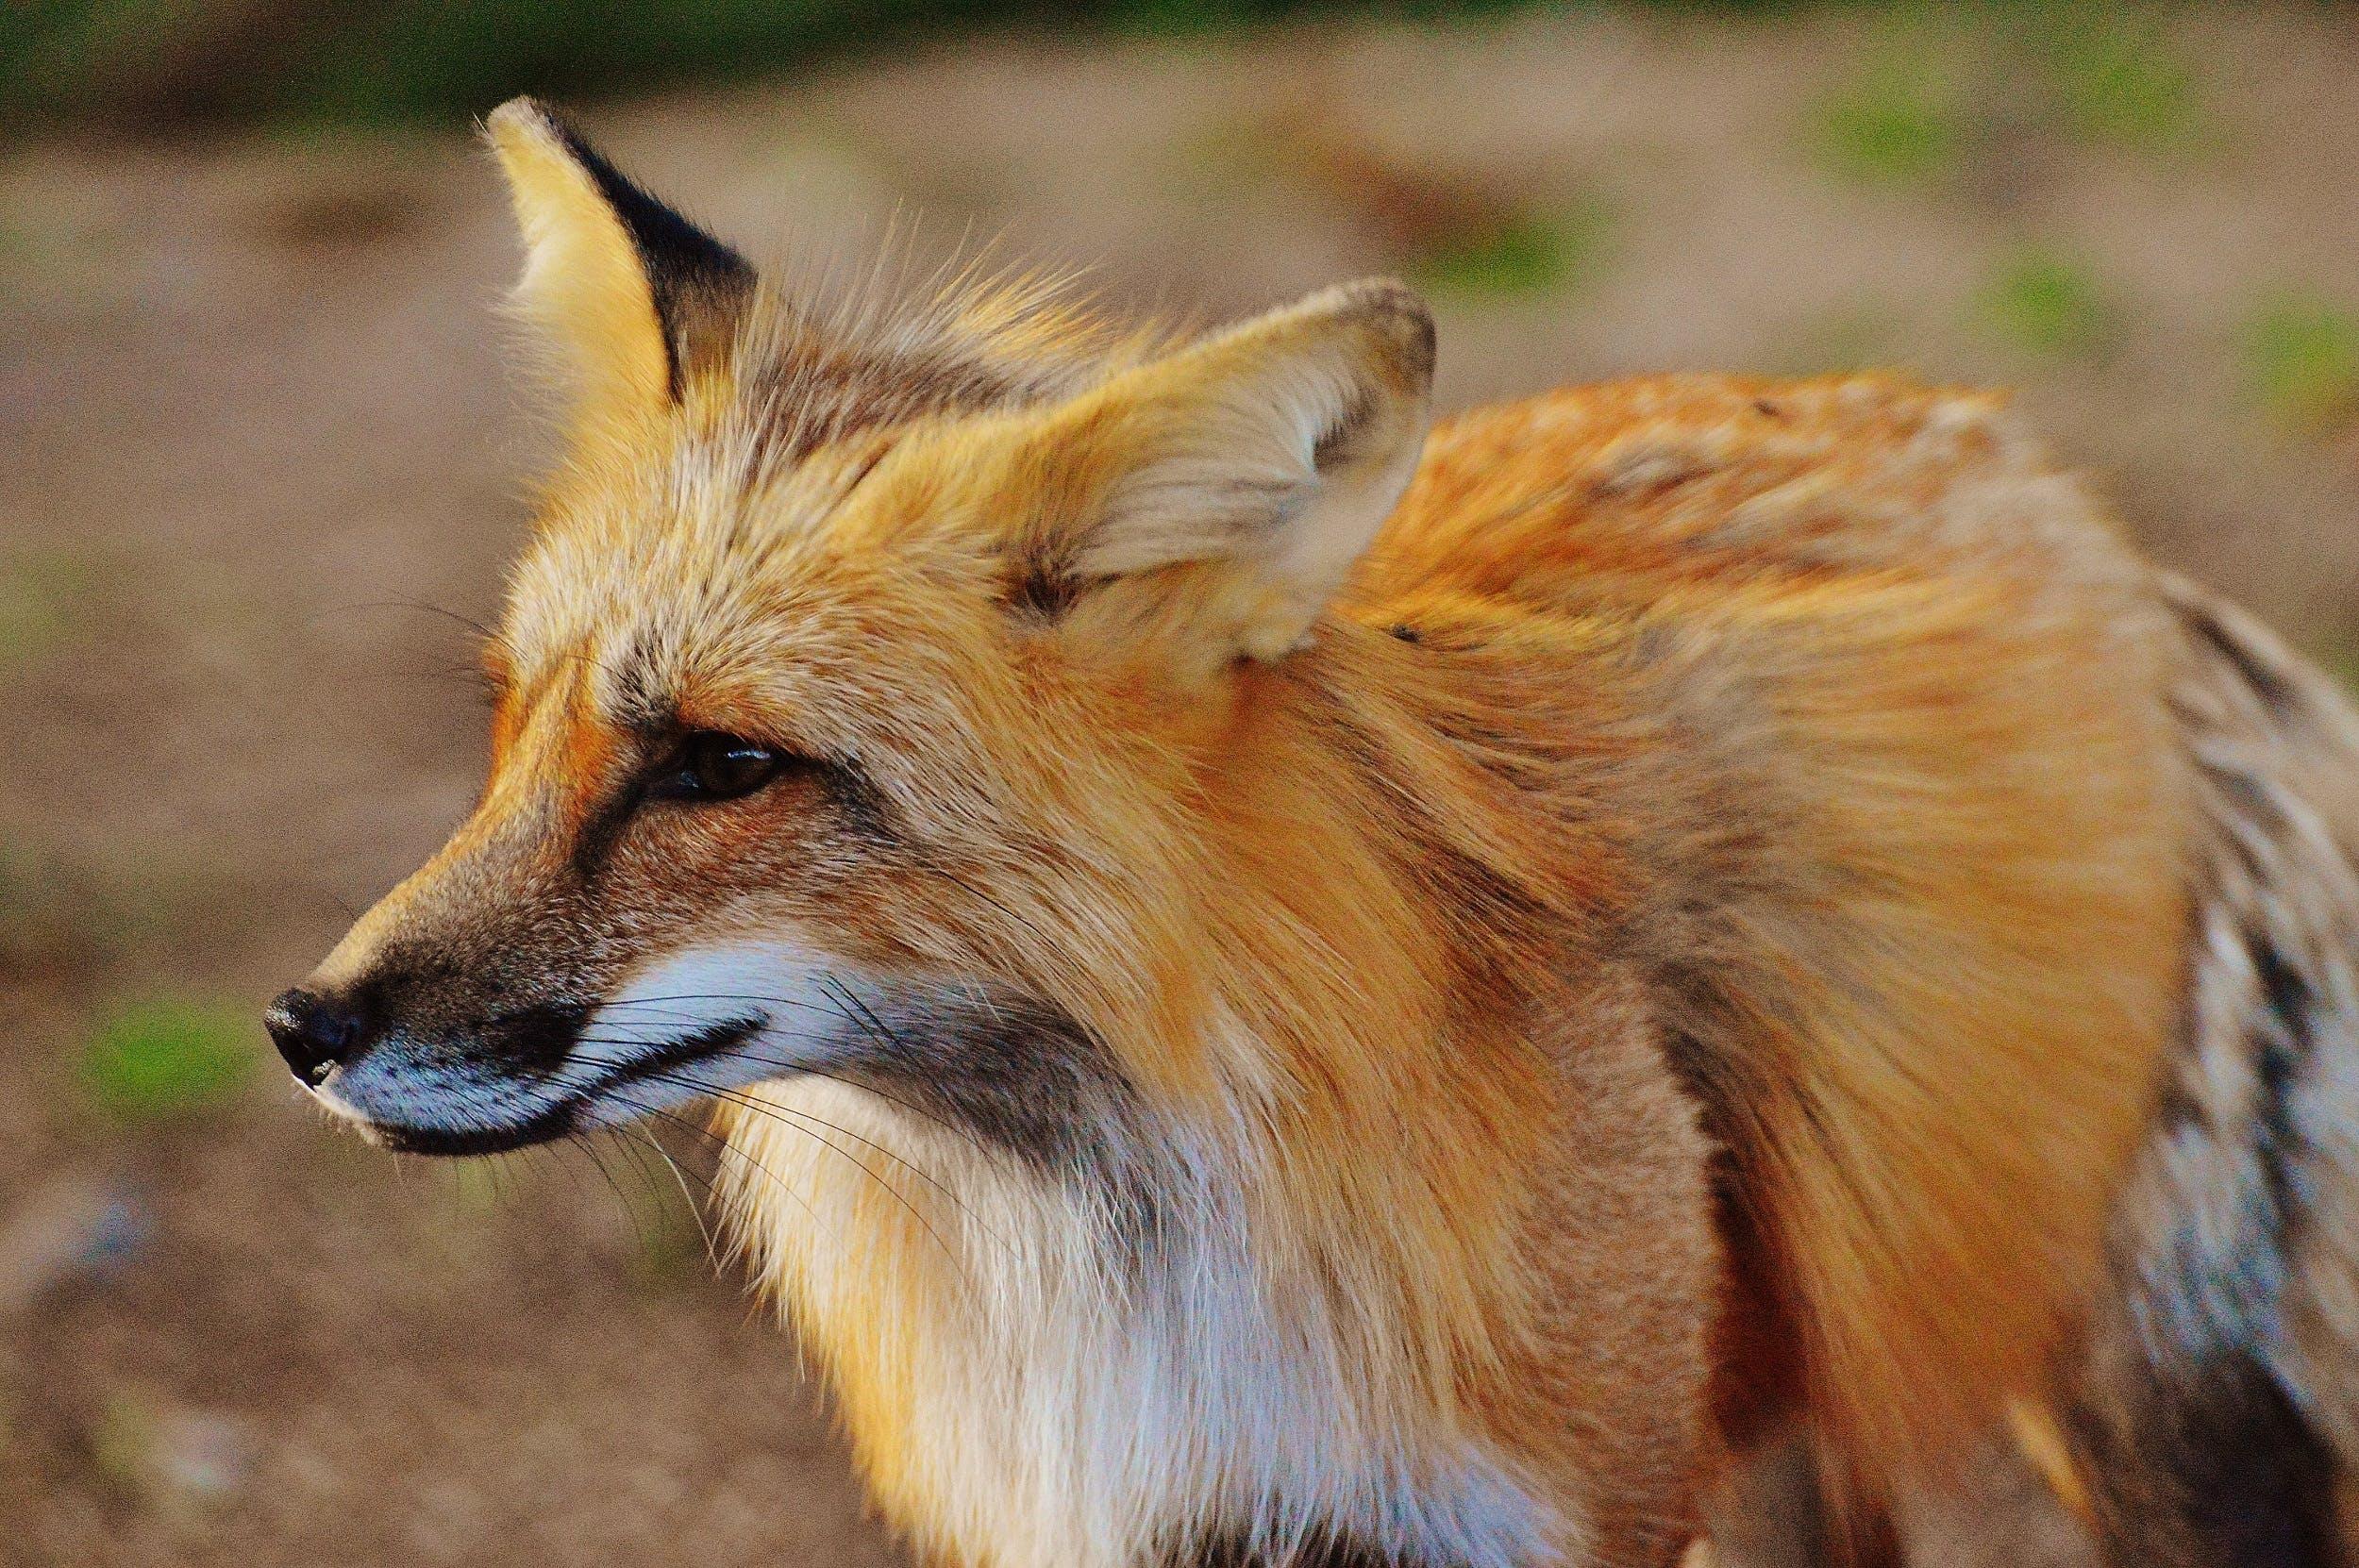 Close Up Photo of True Fox Animal at Daytime